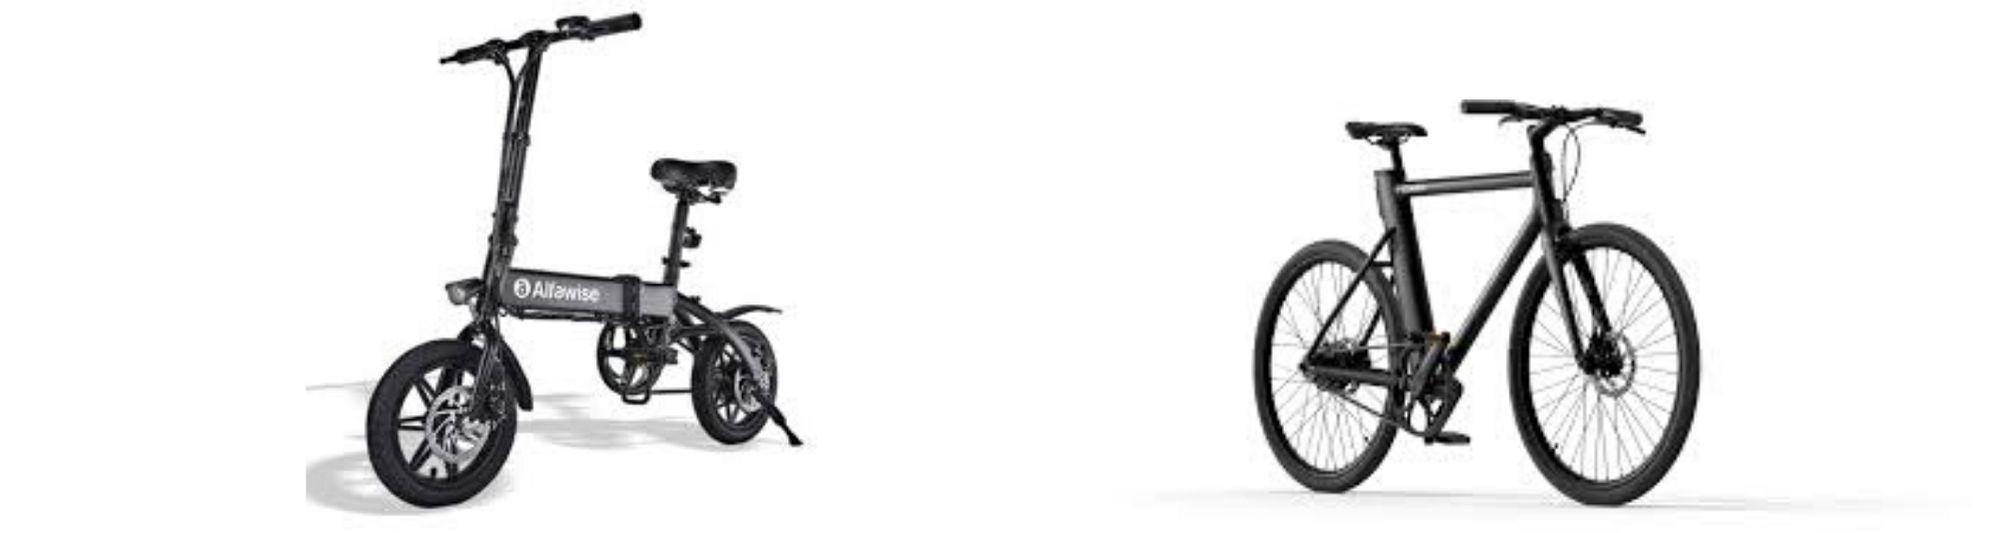 best electric bikes 2021